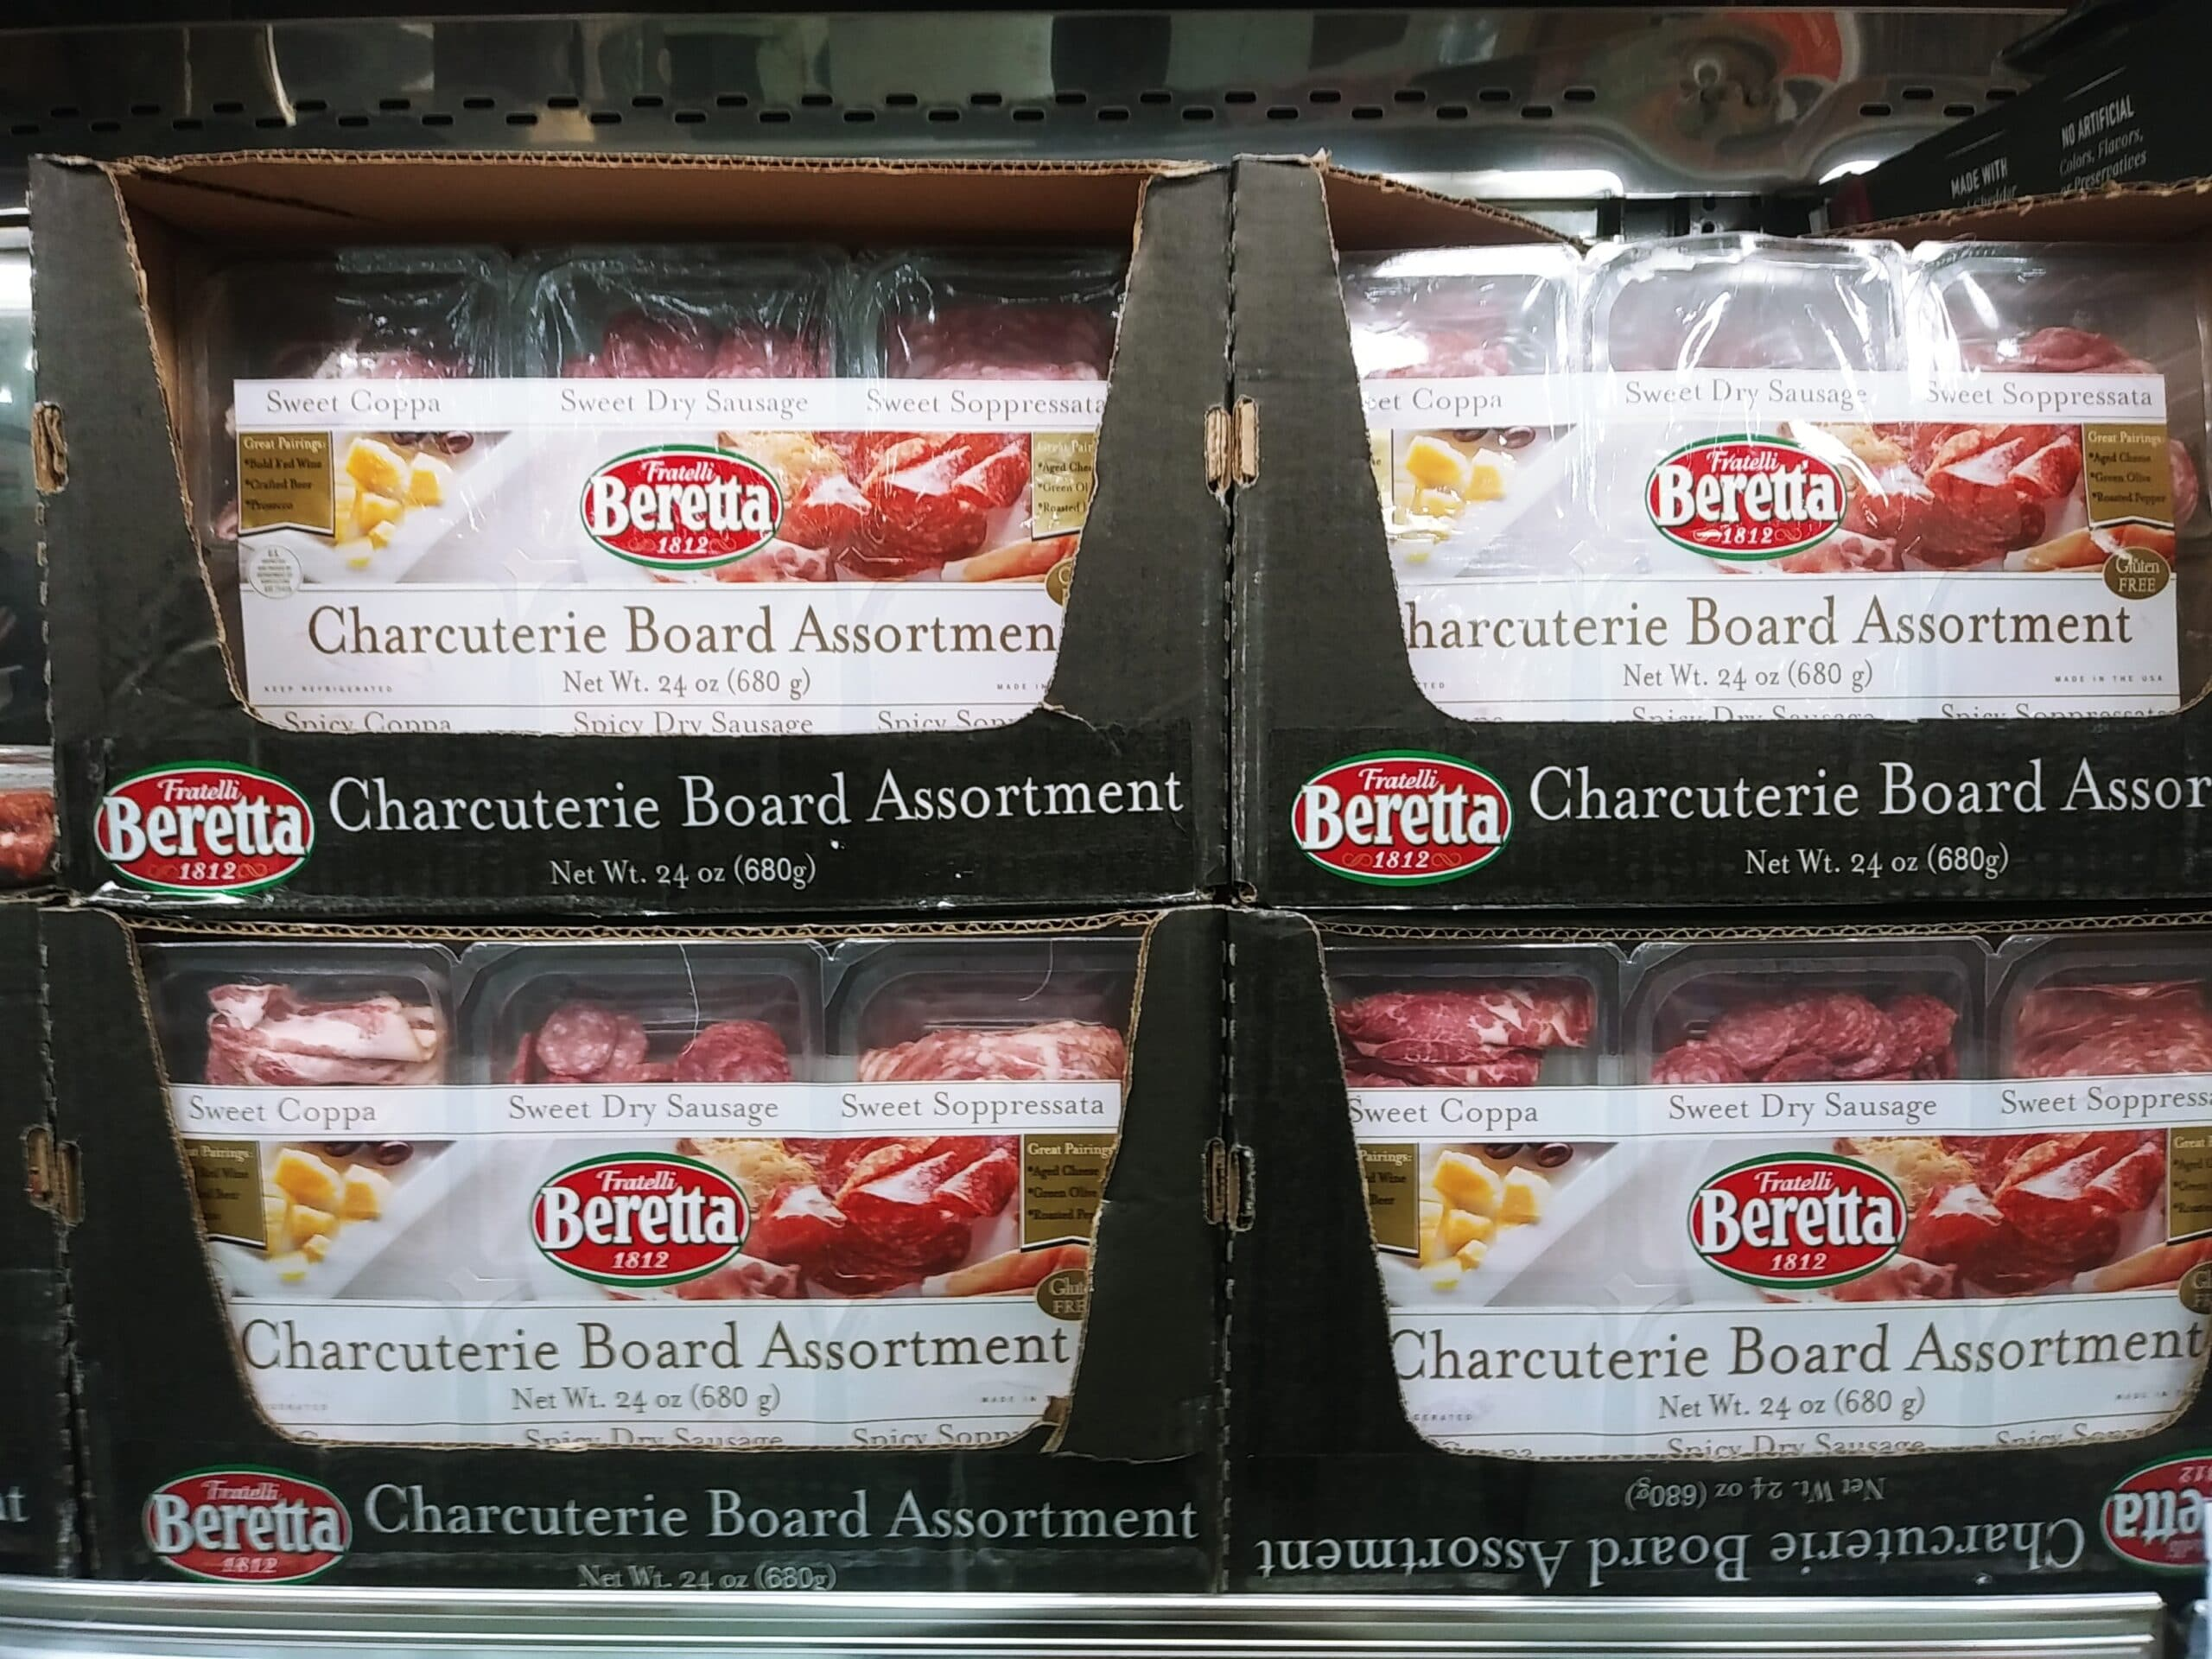 Charcuterie Board Assortment $13.99